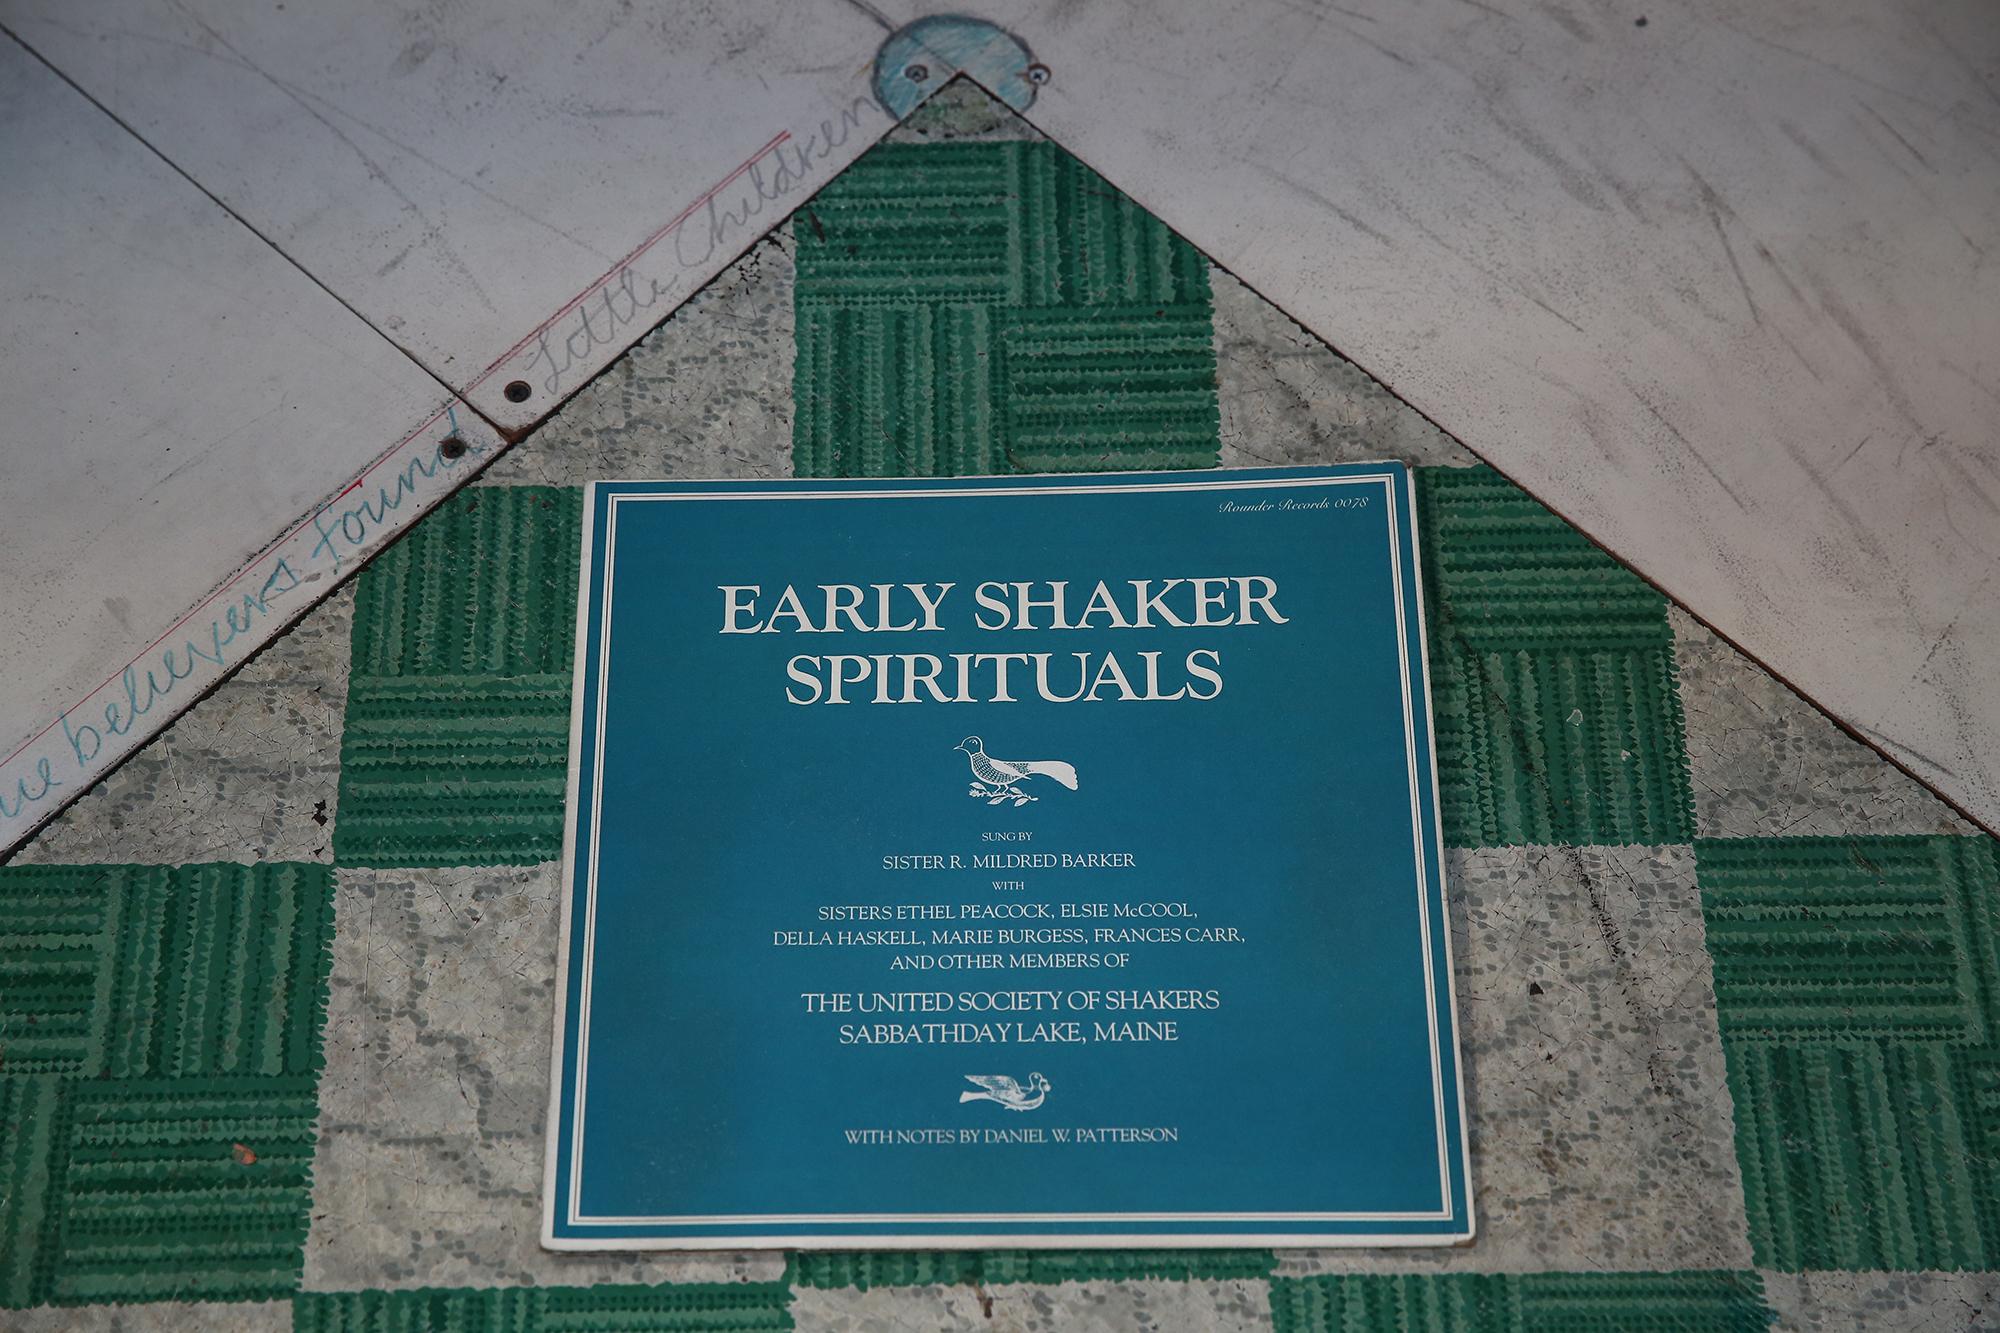 Early Shaker Spirituals - Photo by Paula Court